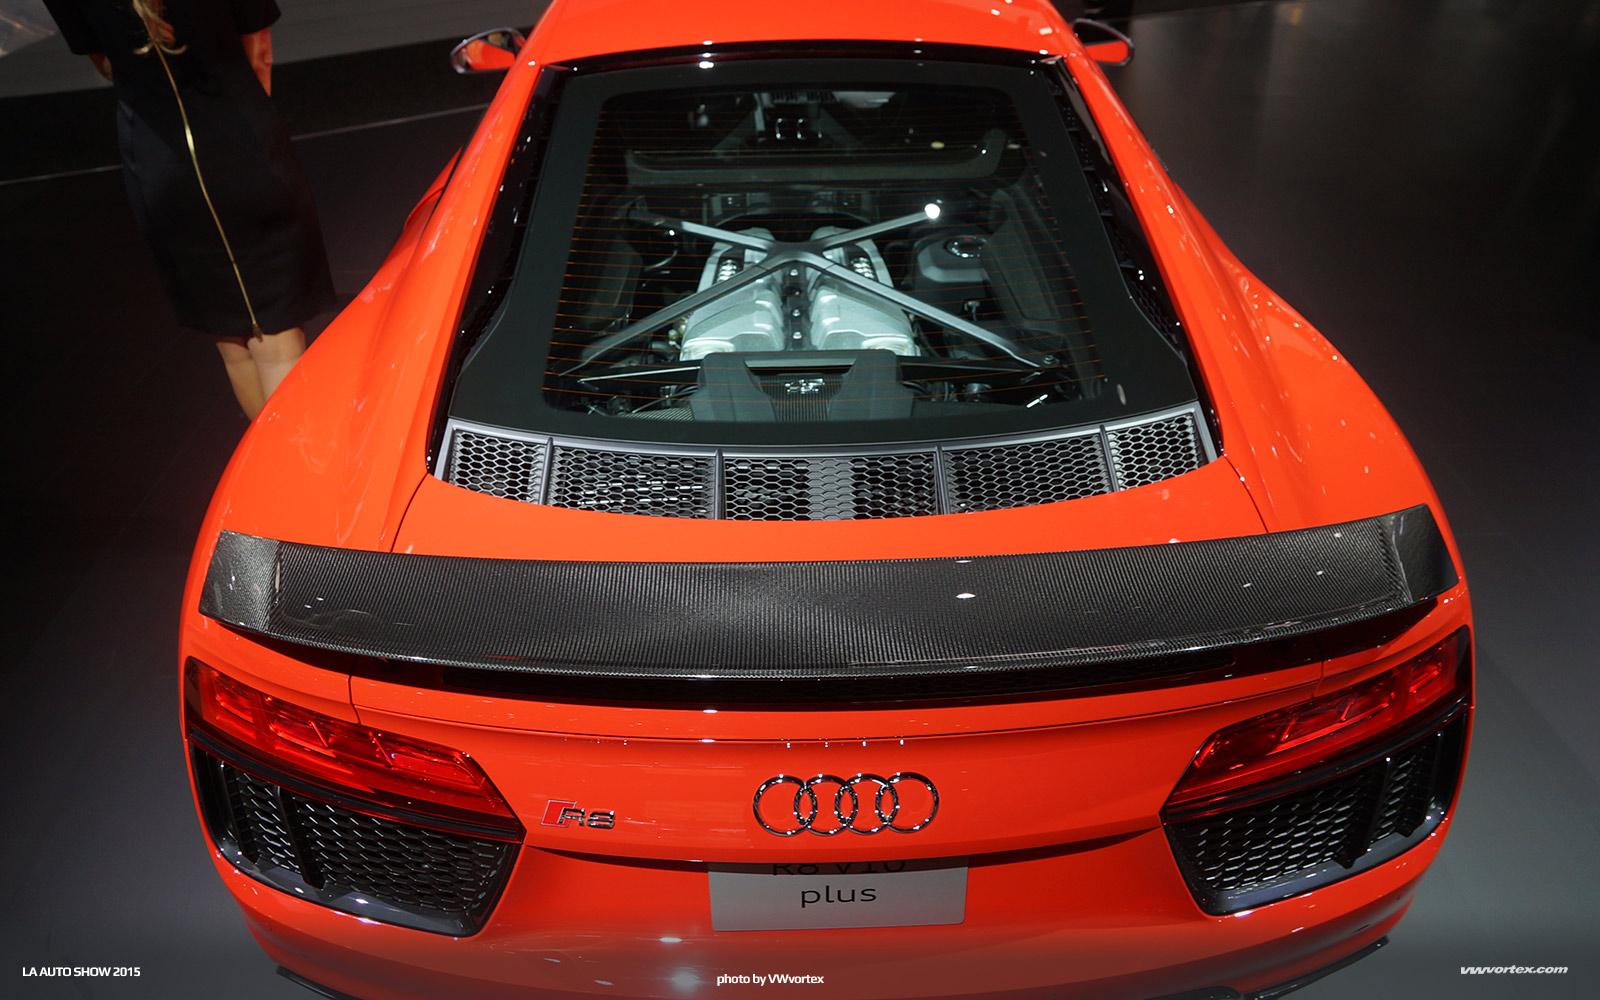 Audi-S1-pq25-carbon-fiber-grille-Neidfaktor-409